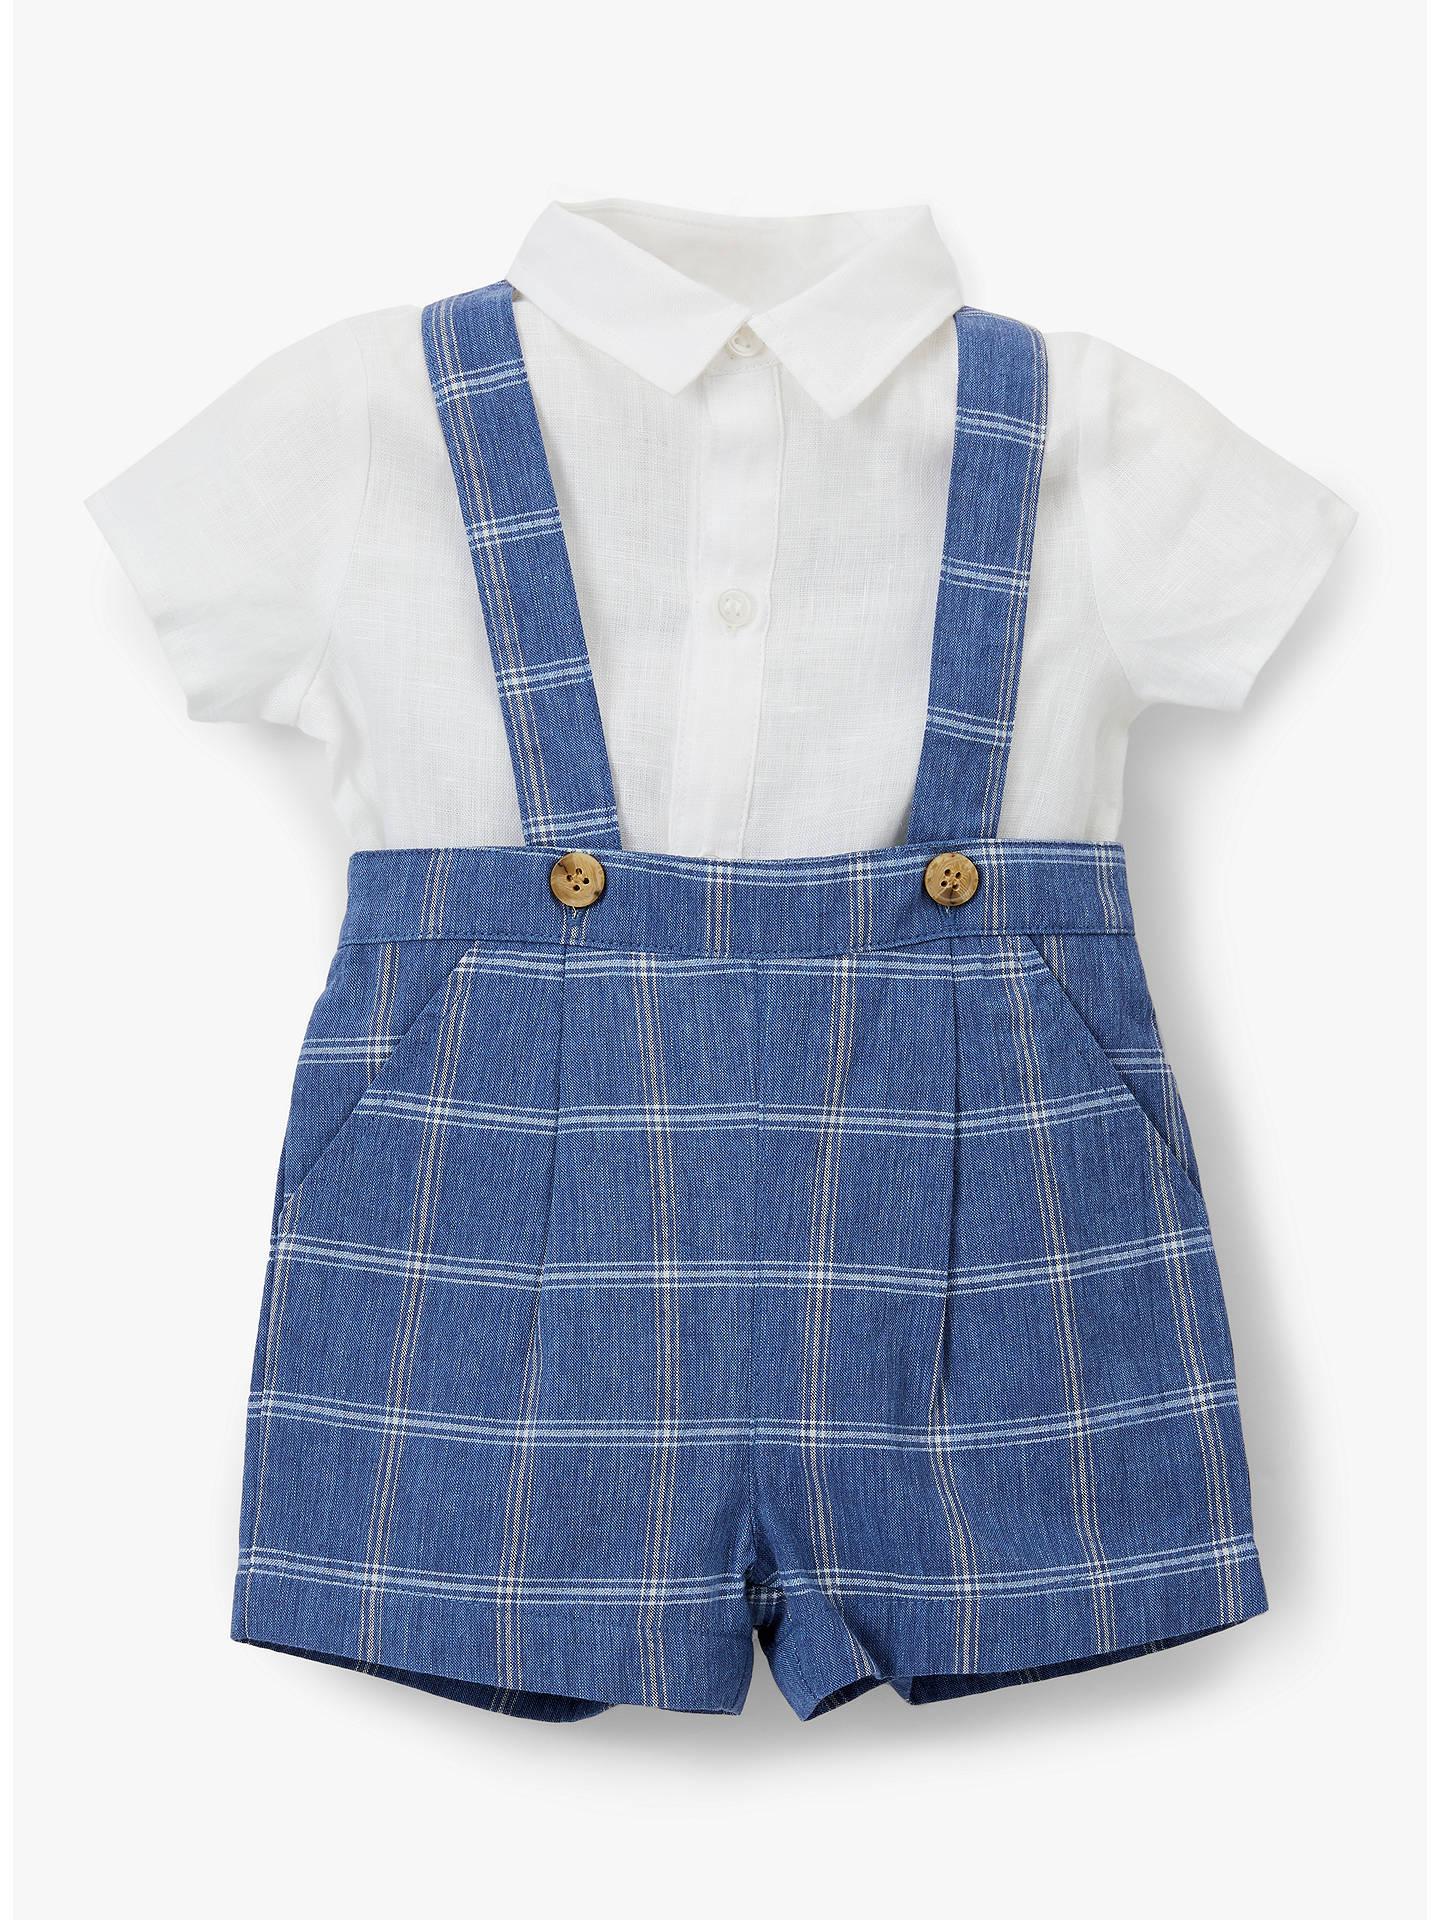 c4060784b Buy John Lewis & Partners Heirloom Collection Linen Check Print Bibshort  and Shirt Set, Blue ...